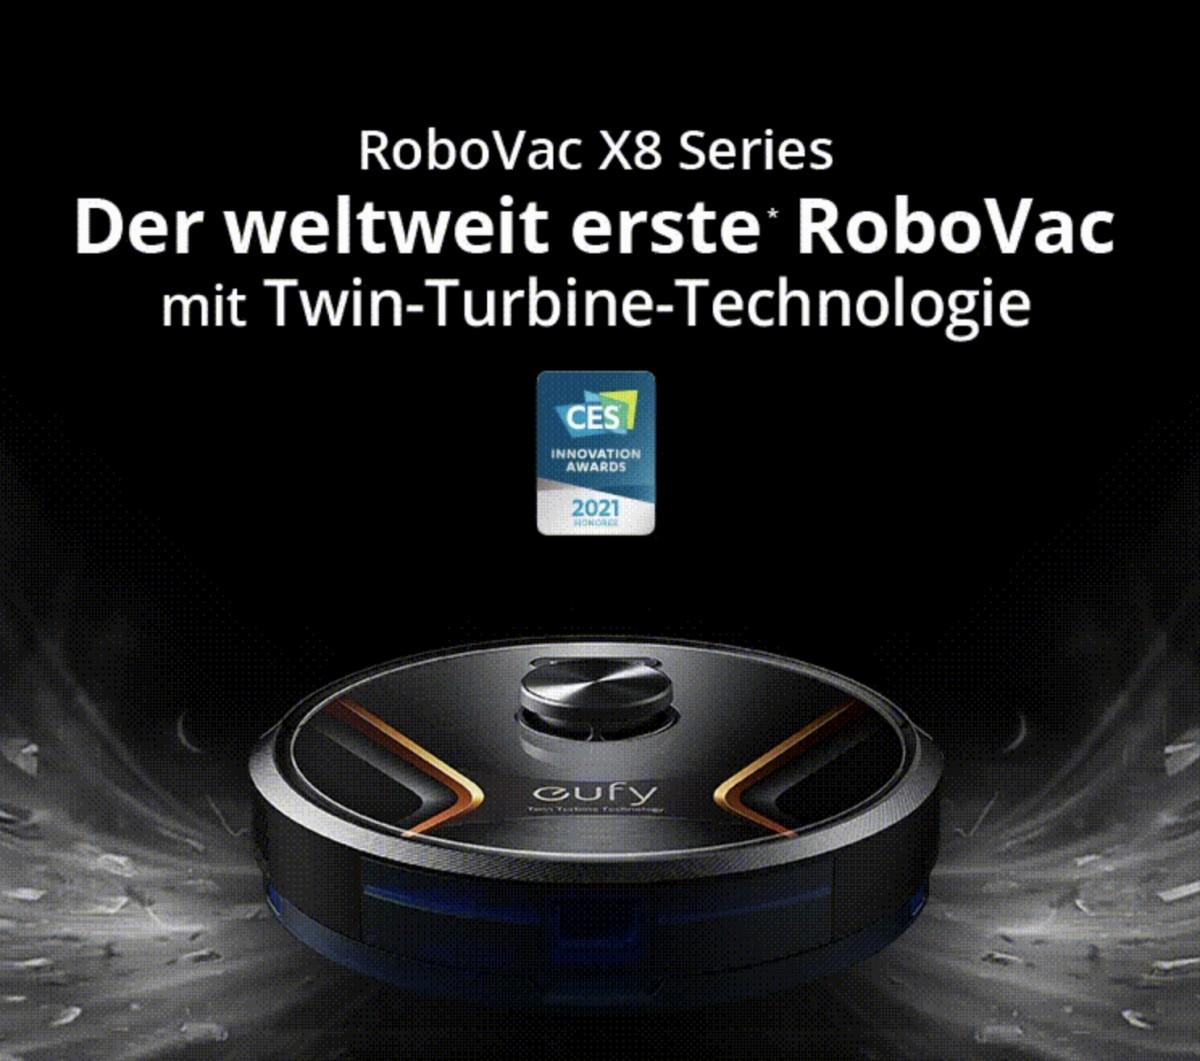 Eufy RoboVac X8 Hybrid: Saugroboter mit Doppel-Turbine vorgestellt